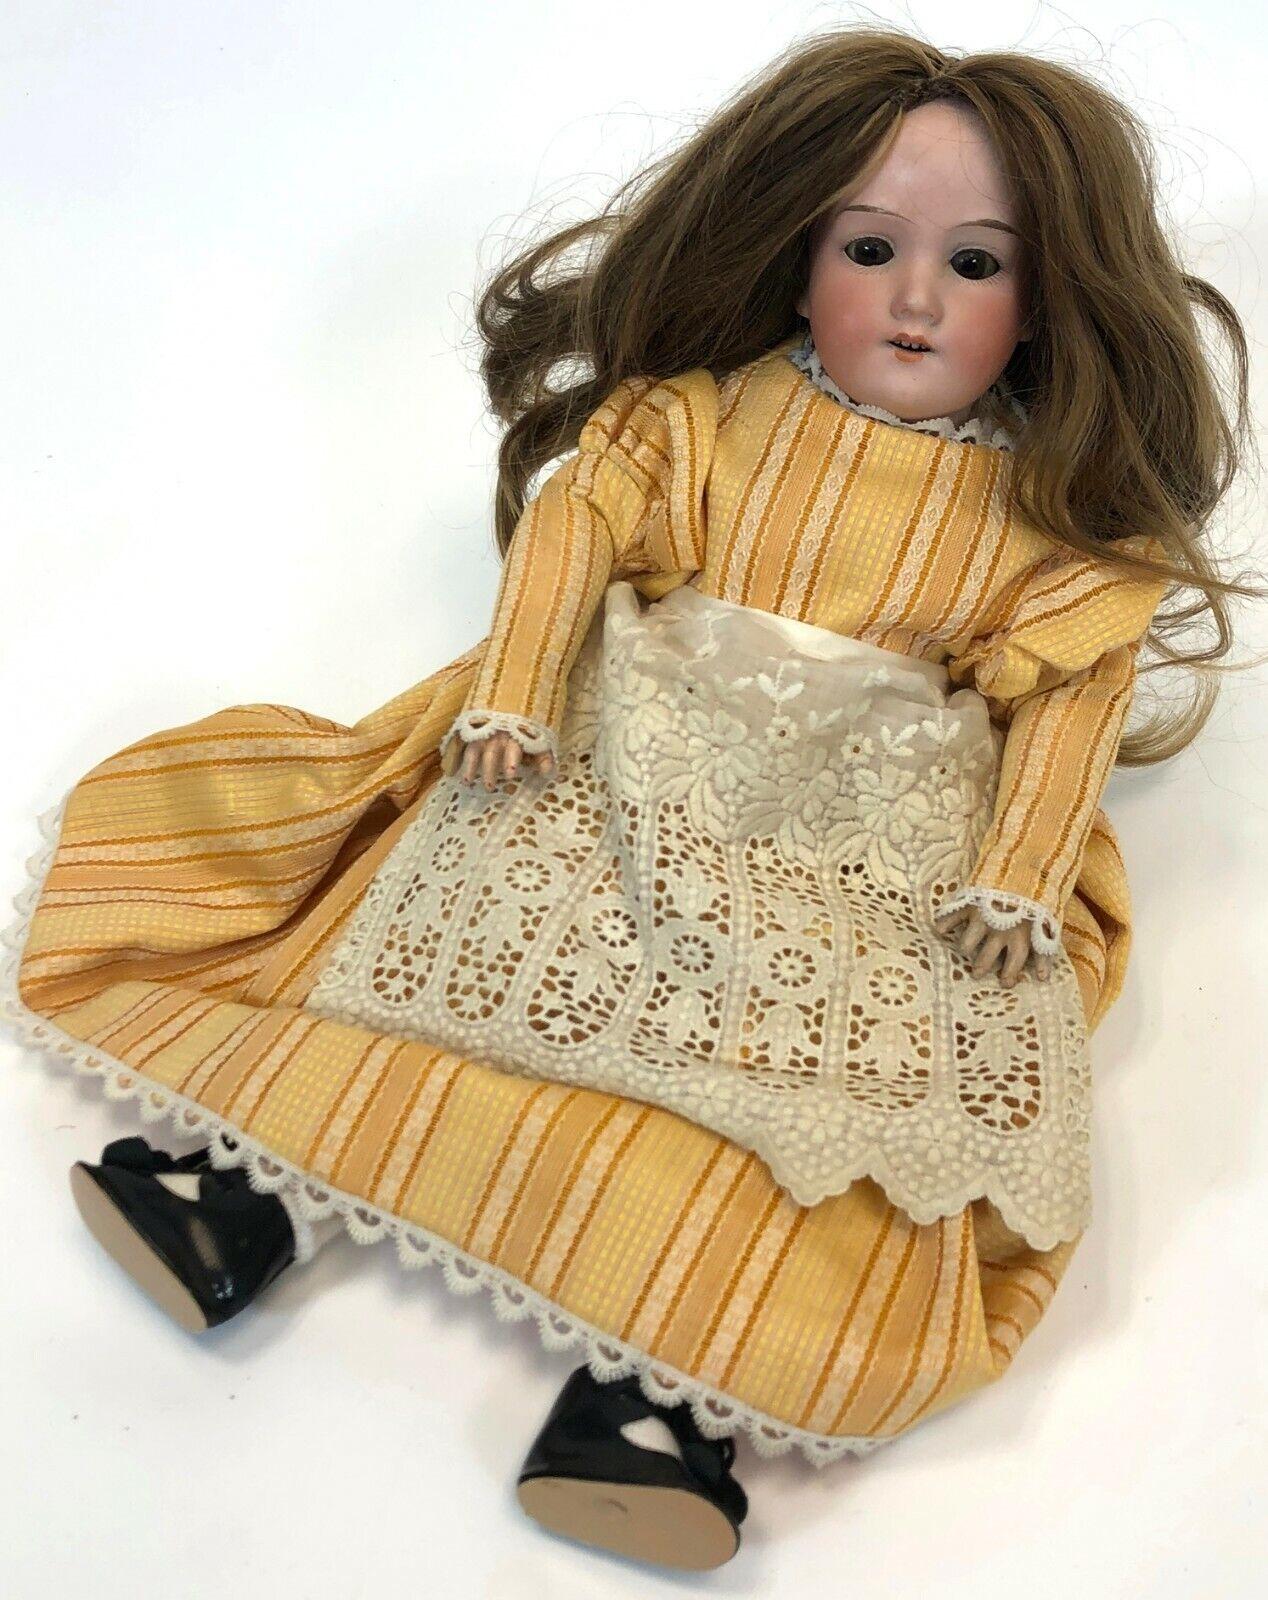 Antique Aruomod Marseille Geruomoy 390 DRGM 24 G 1  Bisque Porcelain 16  Girl bambola  benvenuto per ordinare